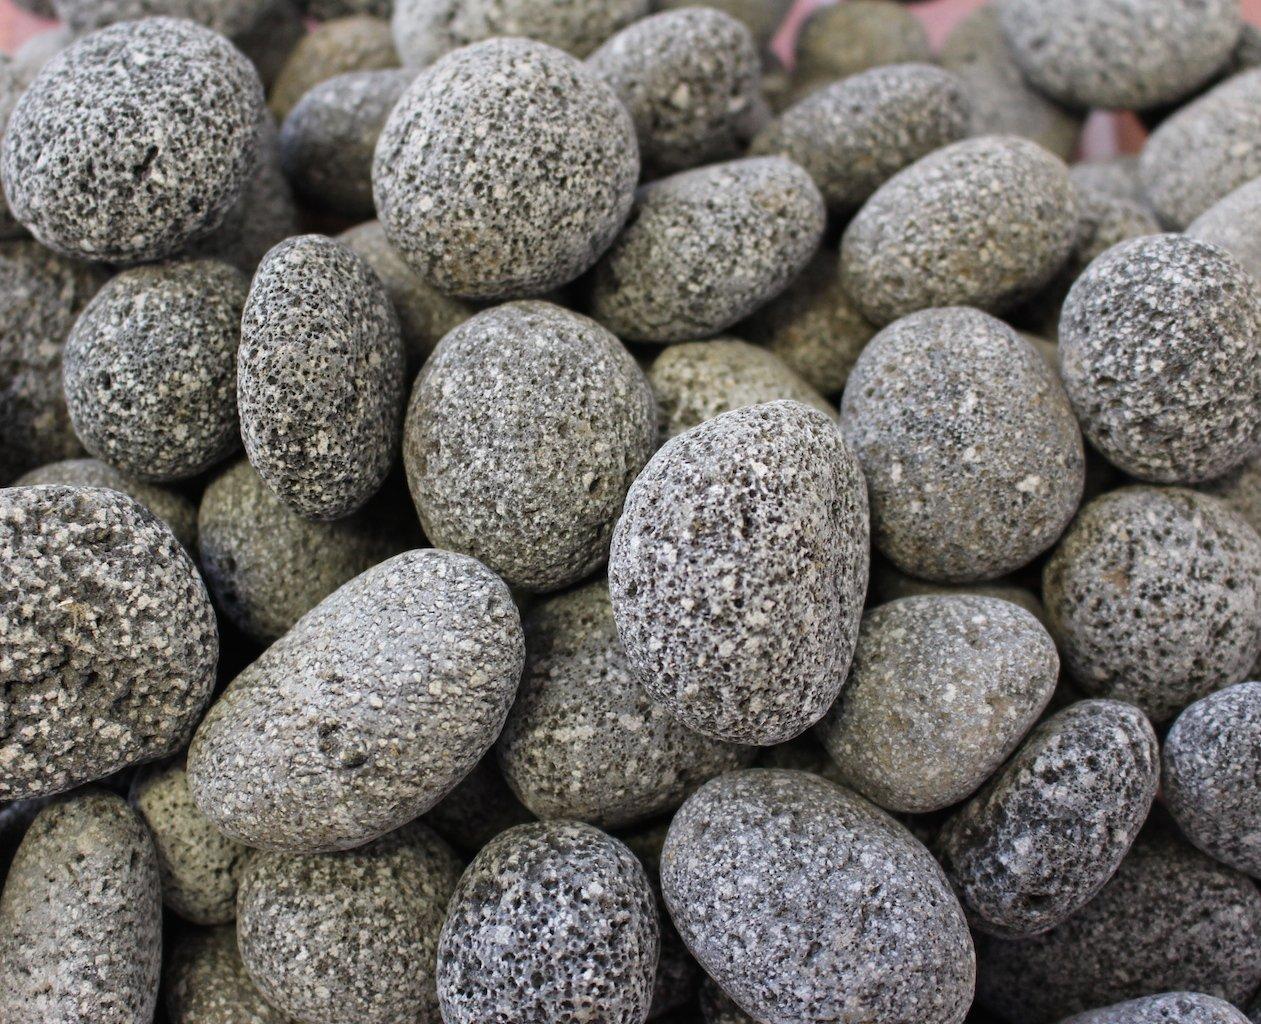 Exotic Fire Glass - Tumbled Black Lava Pebbles - 25lb. Pail with Handle